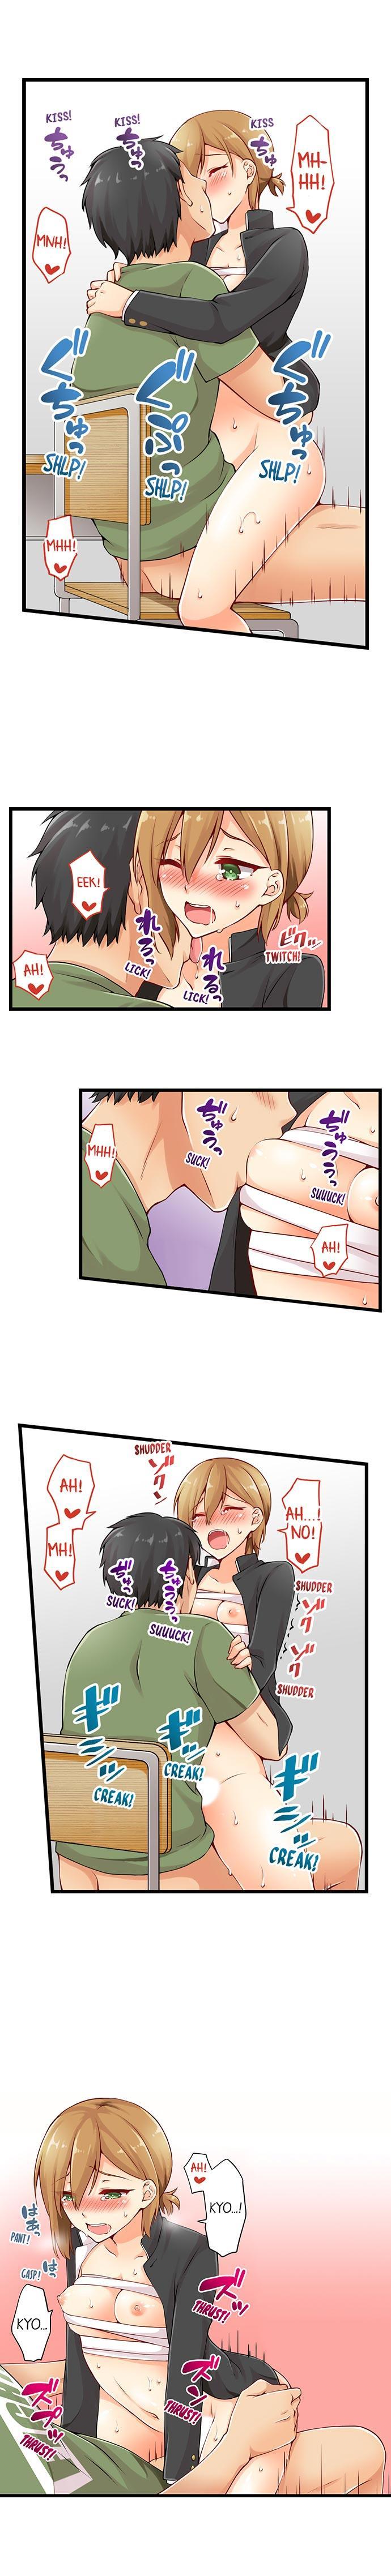 Ren Arisugawa Is Actually A Girl 176